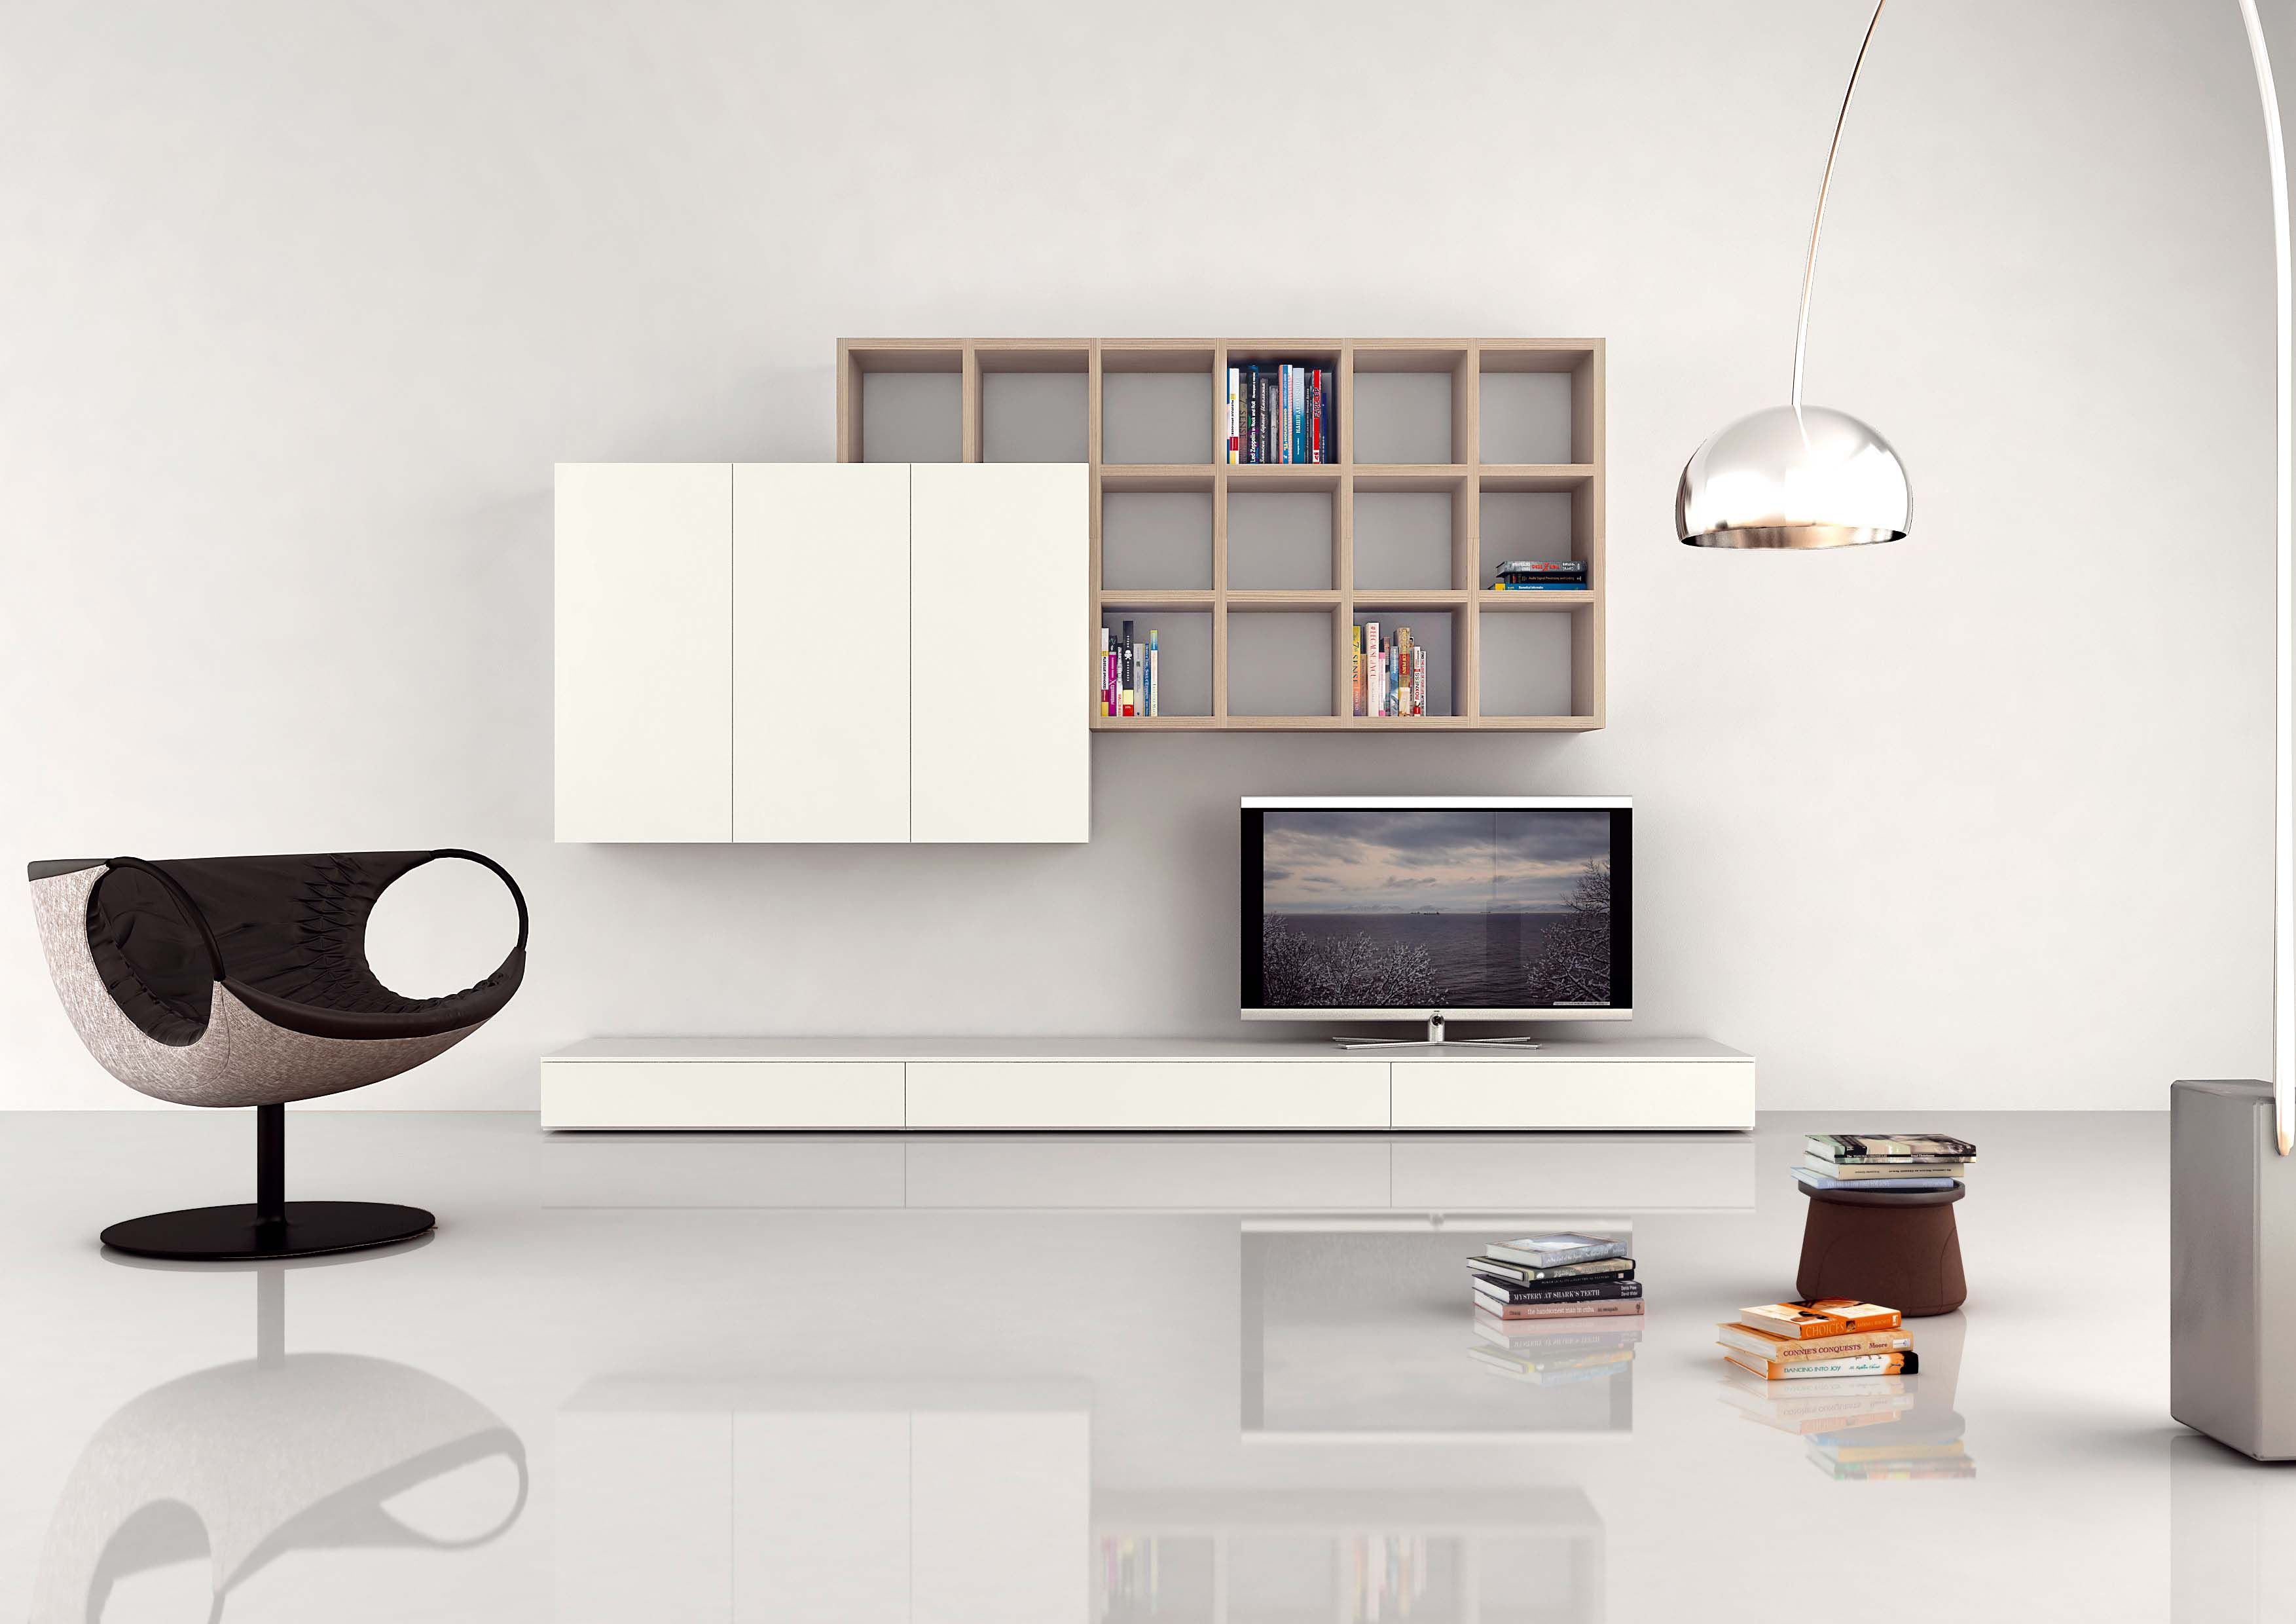 moderne wohnzimmer wohnzimmer modern wohnzimmer im modernen stil - Wohnzimmer Im Modernen Stil